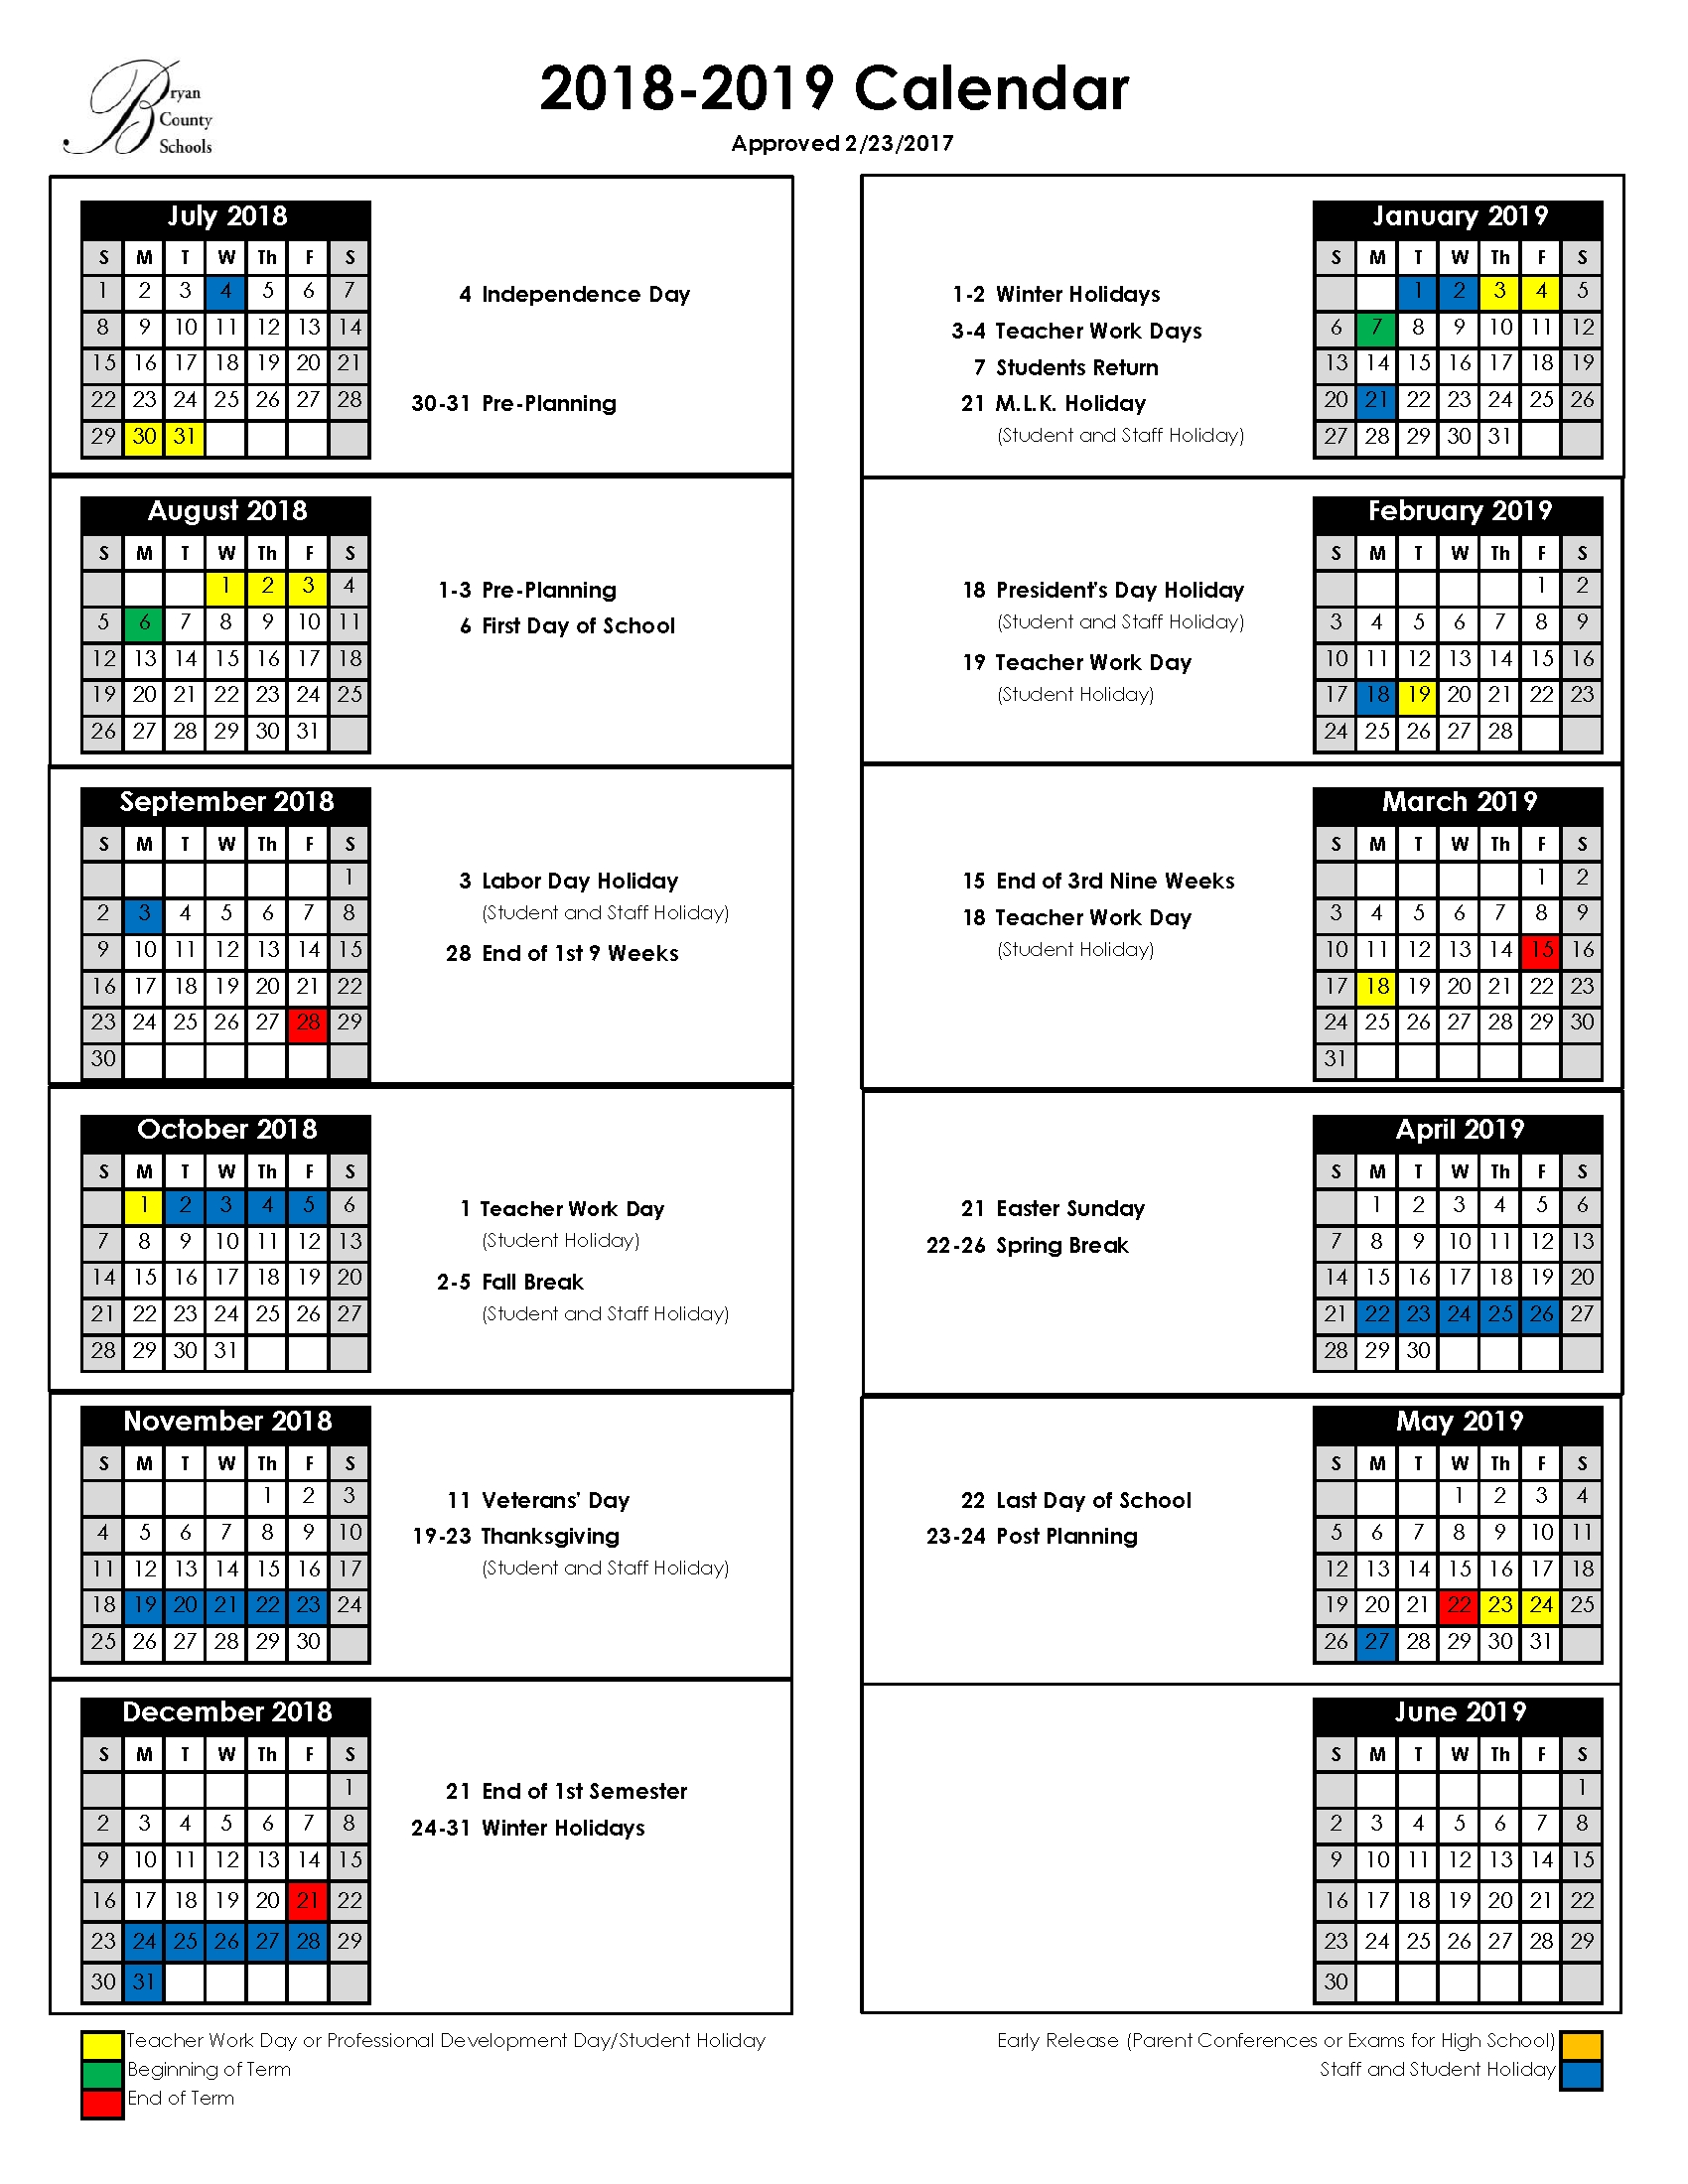 Bryan County Schools School Calendar 2019-20